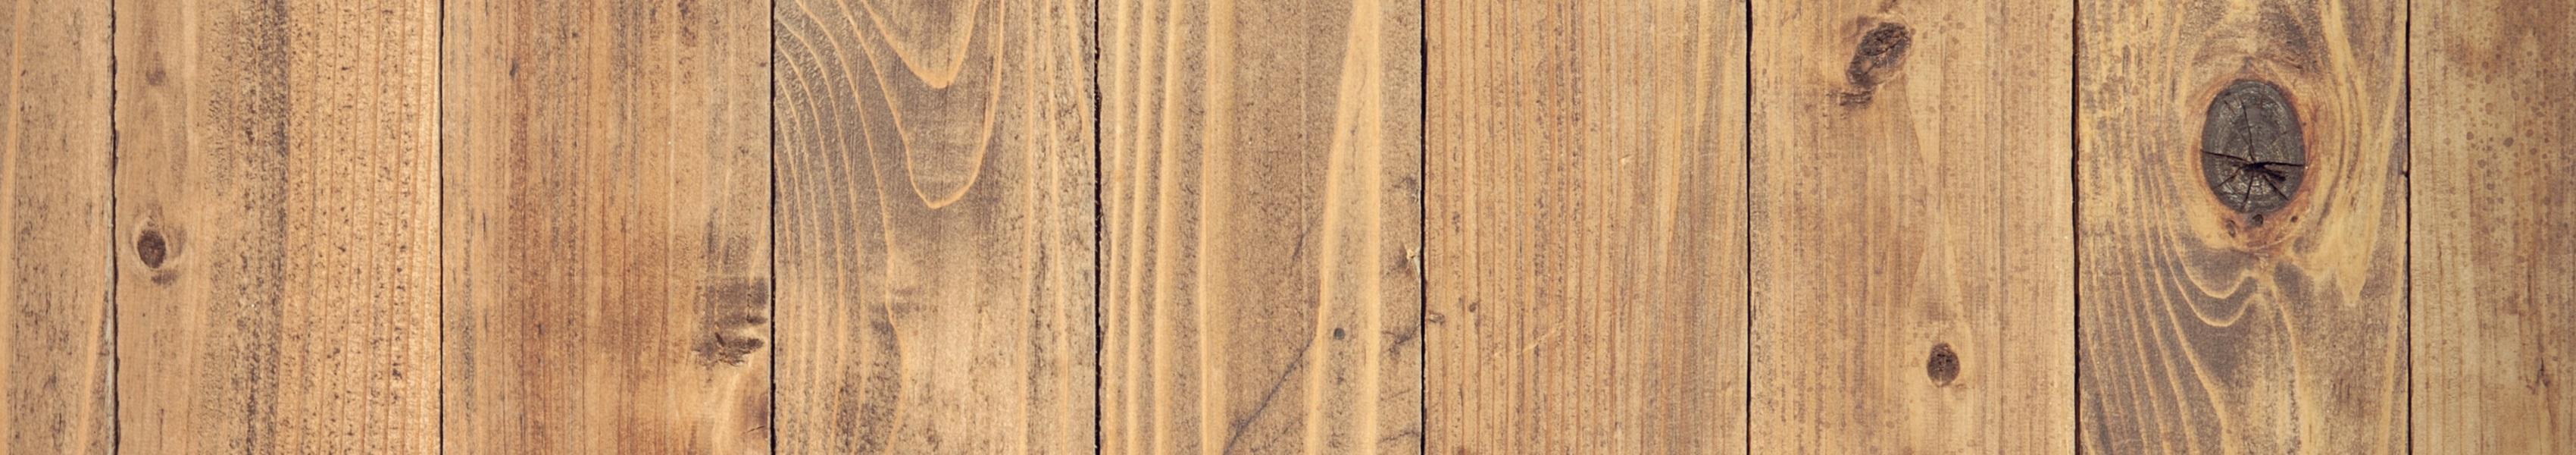 225mm X 75mm (9 X 3) Timber